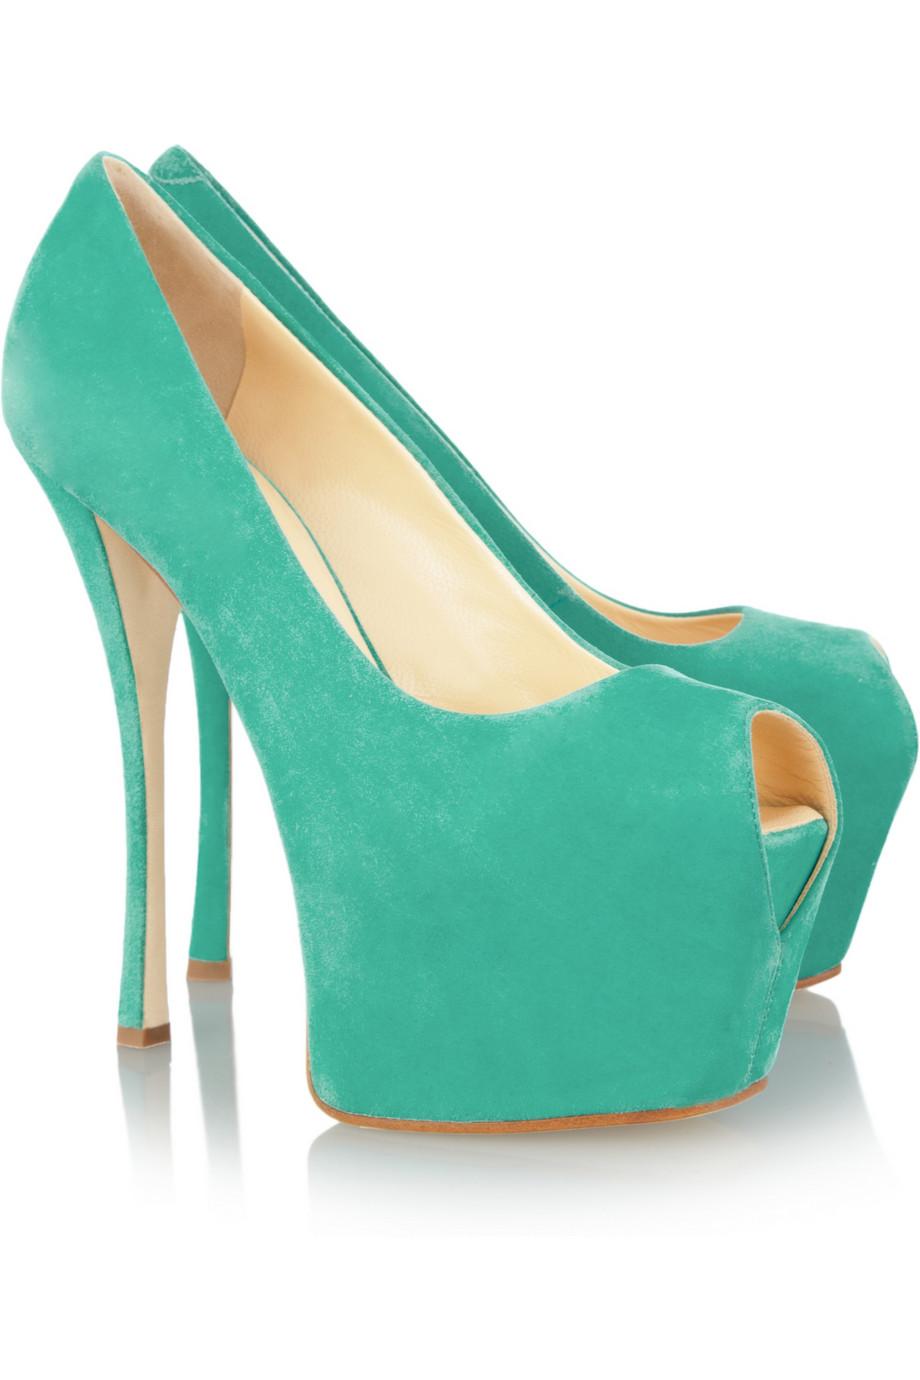 Canada Giuseppe Zanotti Platforms - Shoes Giuseppe Zanotti Suede Platform Pumps